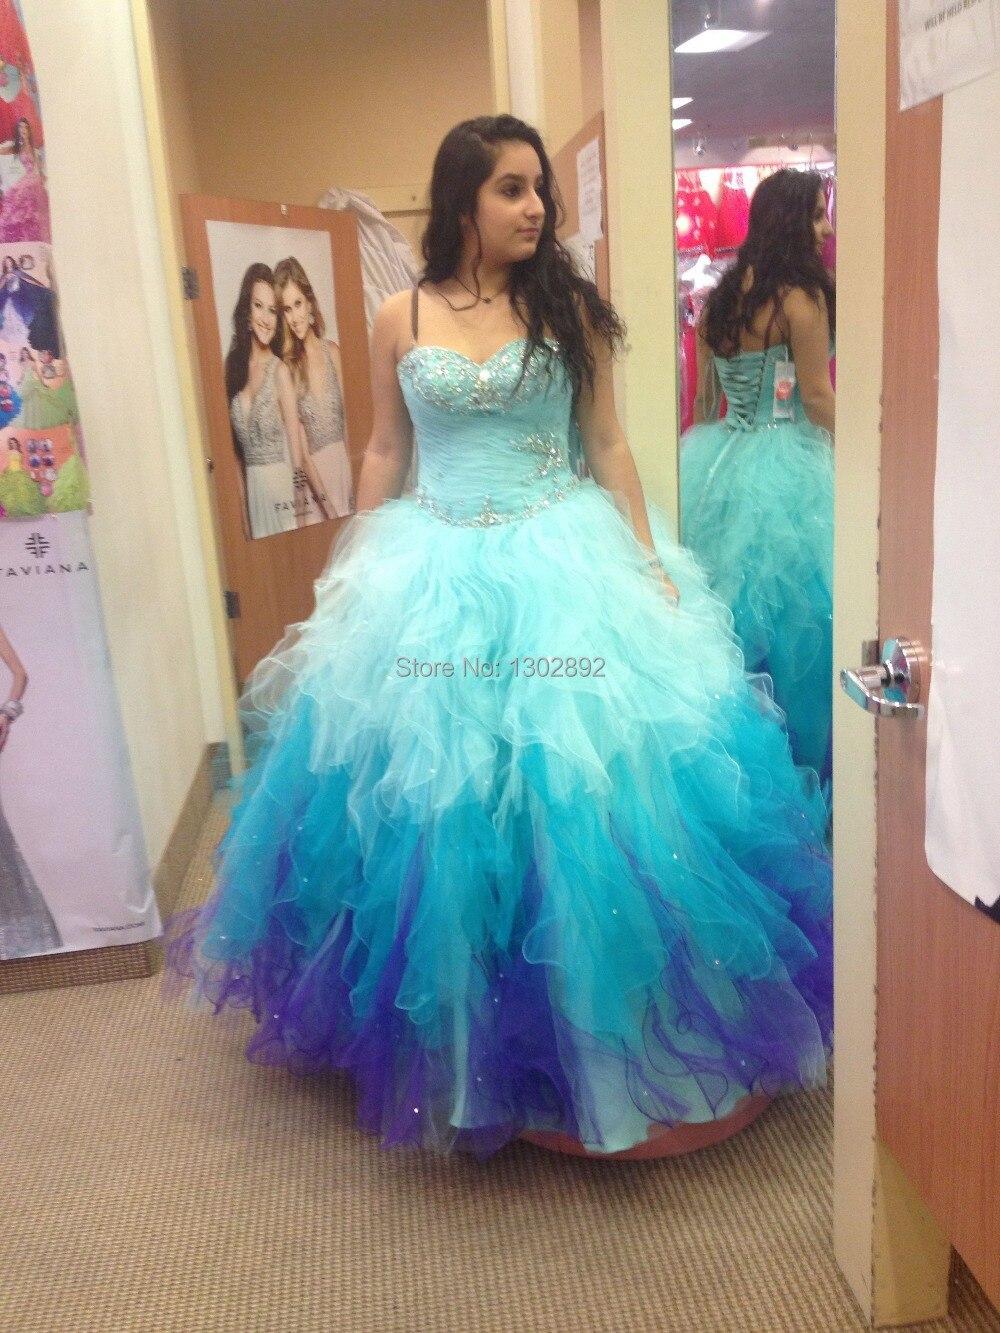 Beautiful Girl Prom Dresses Sketch - All Wedding Dresses ...